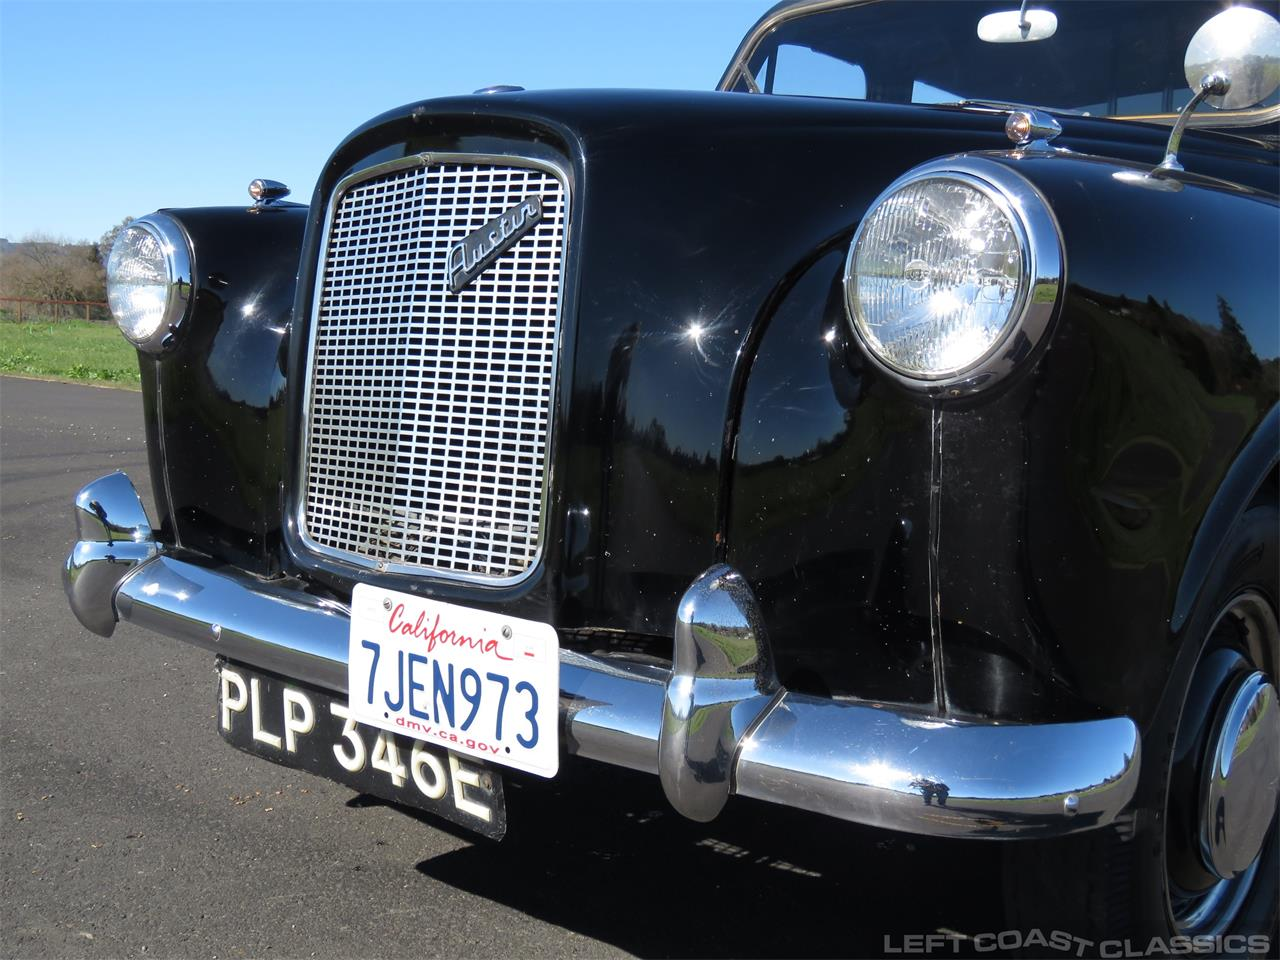 Large Picture of Classic 1967 Austin FX4 Taxi Cab located in SONOMA California - PKBX